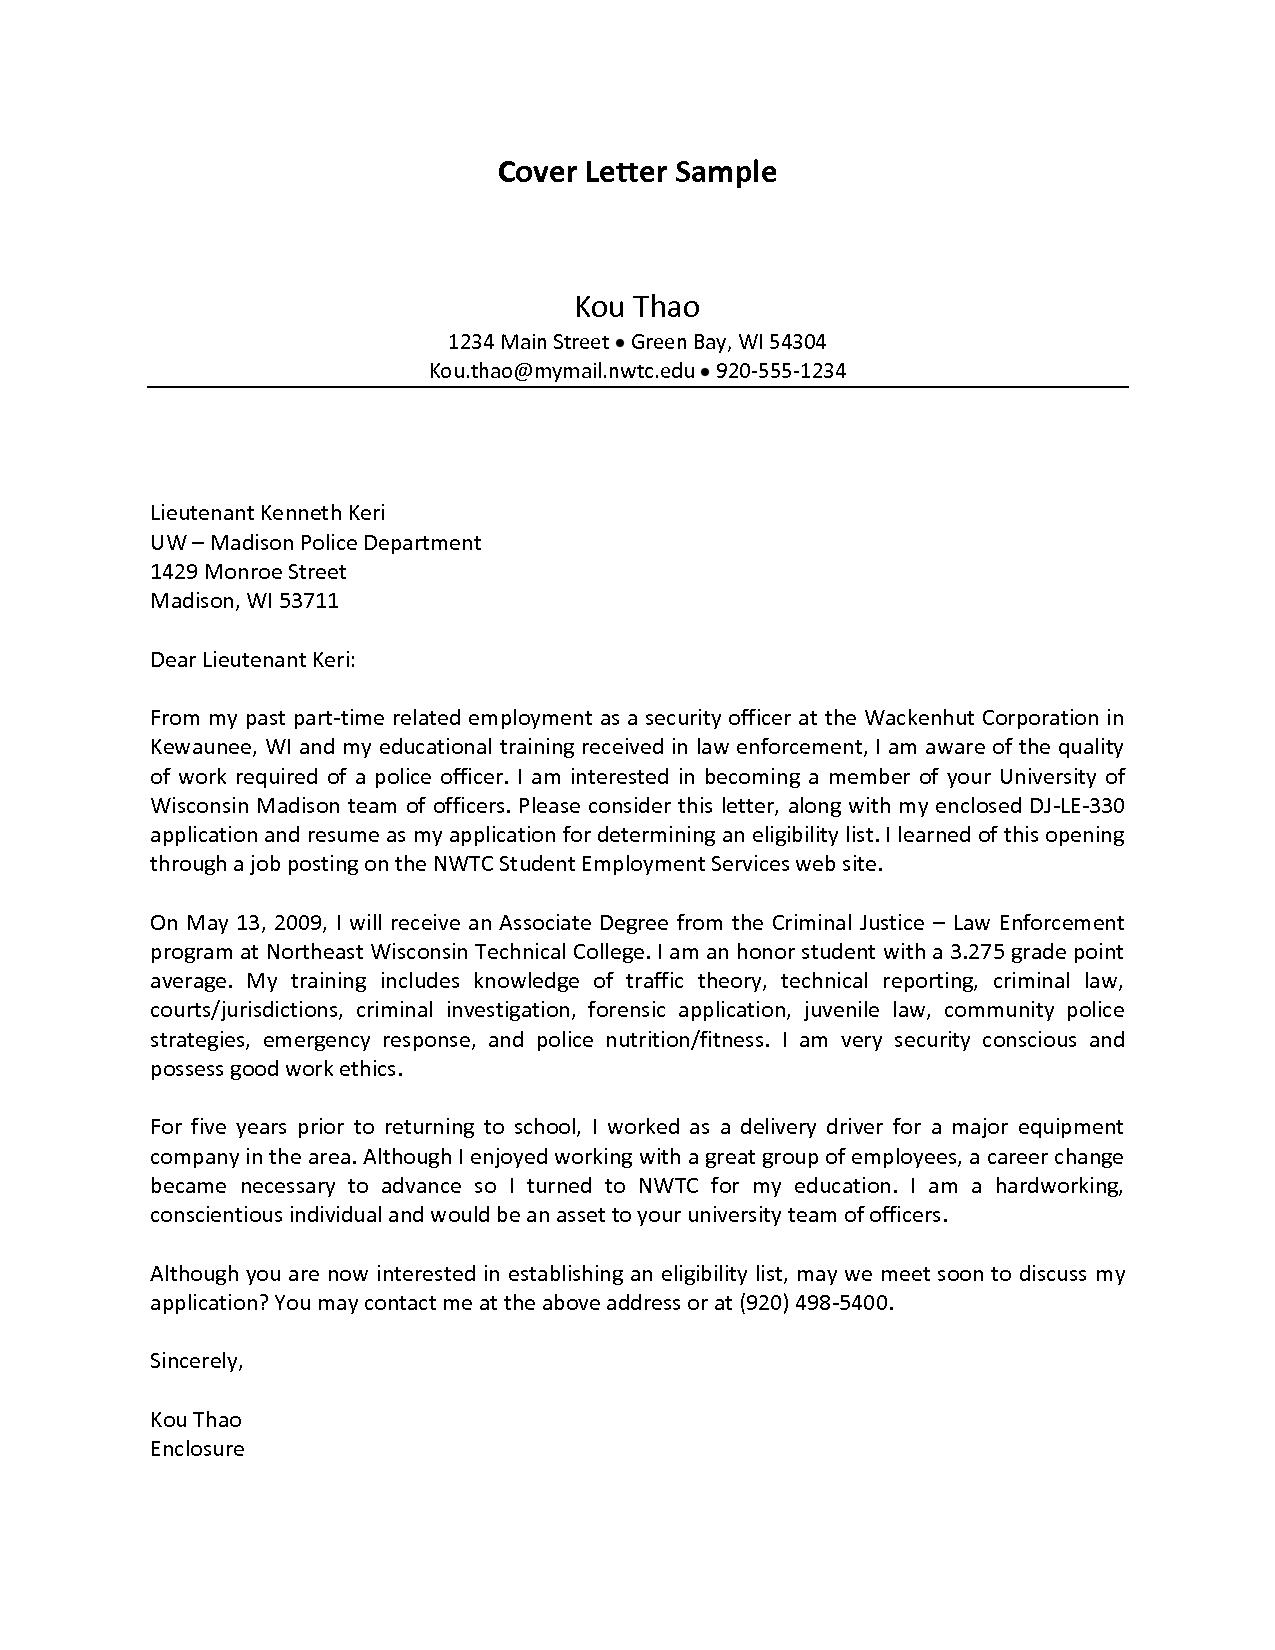 Cover Letter Examples Kent Uni marchigianadoc